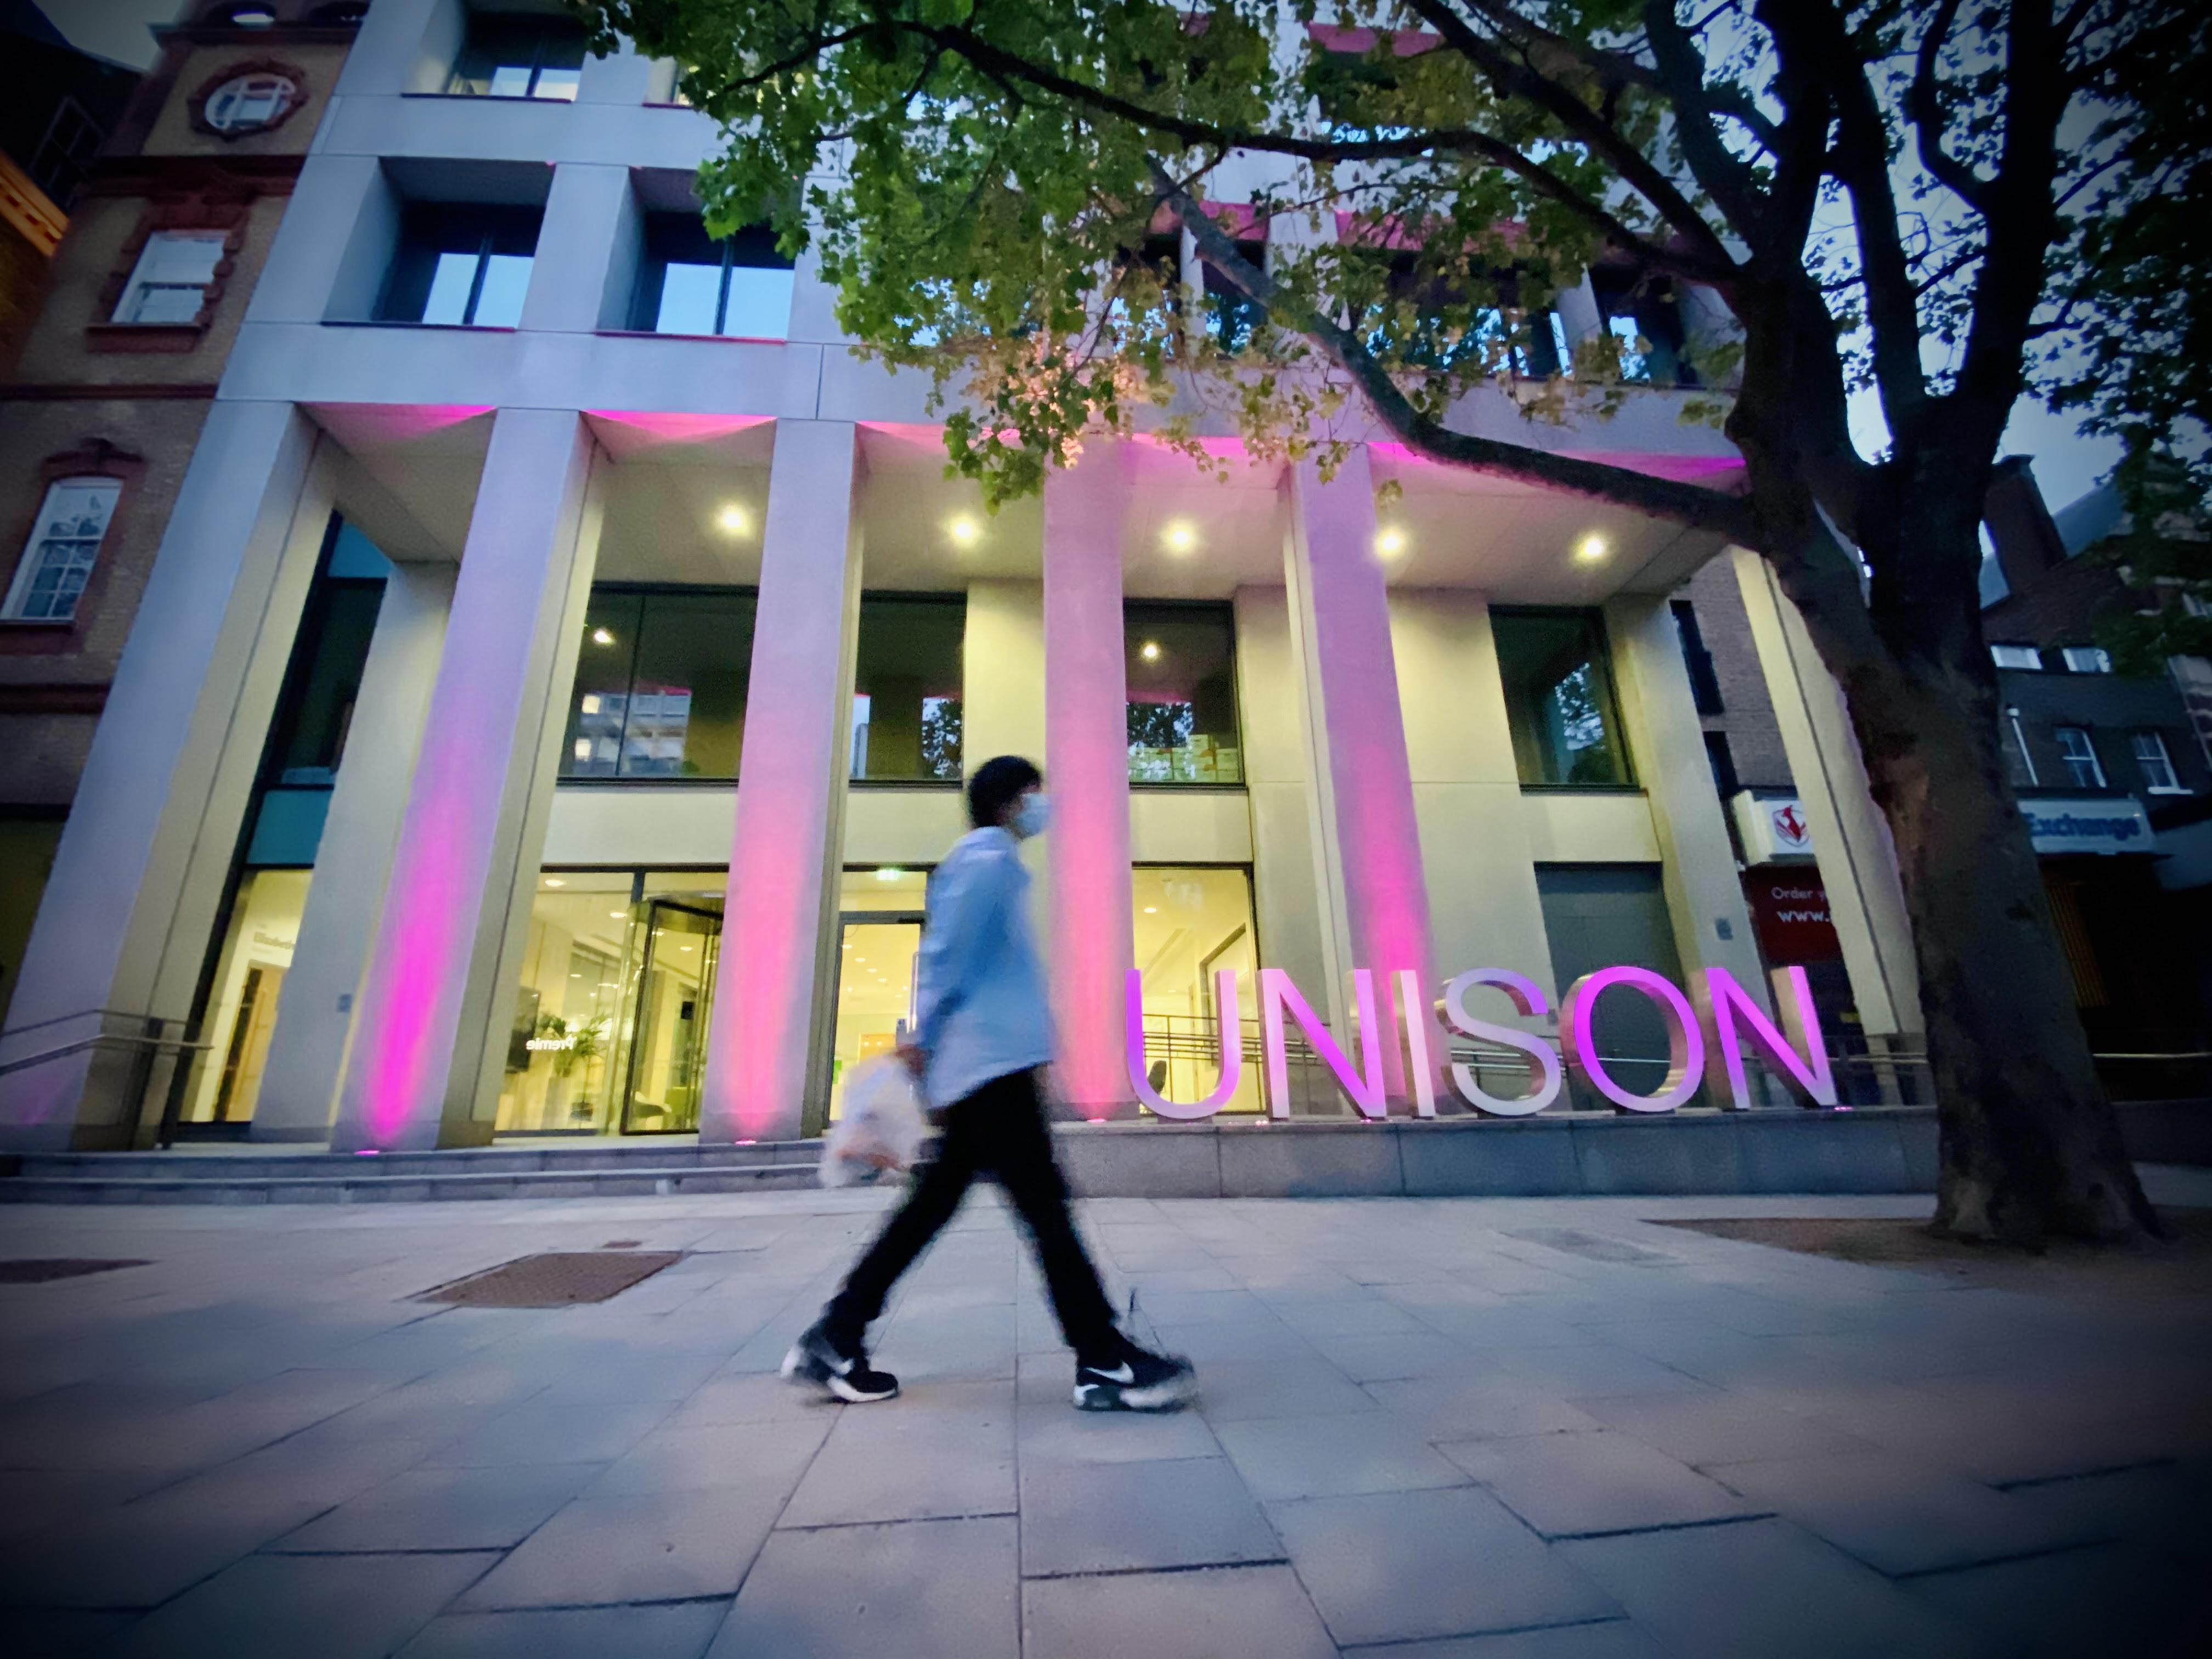 UNISON Centre lit in purple